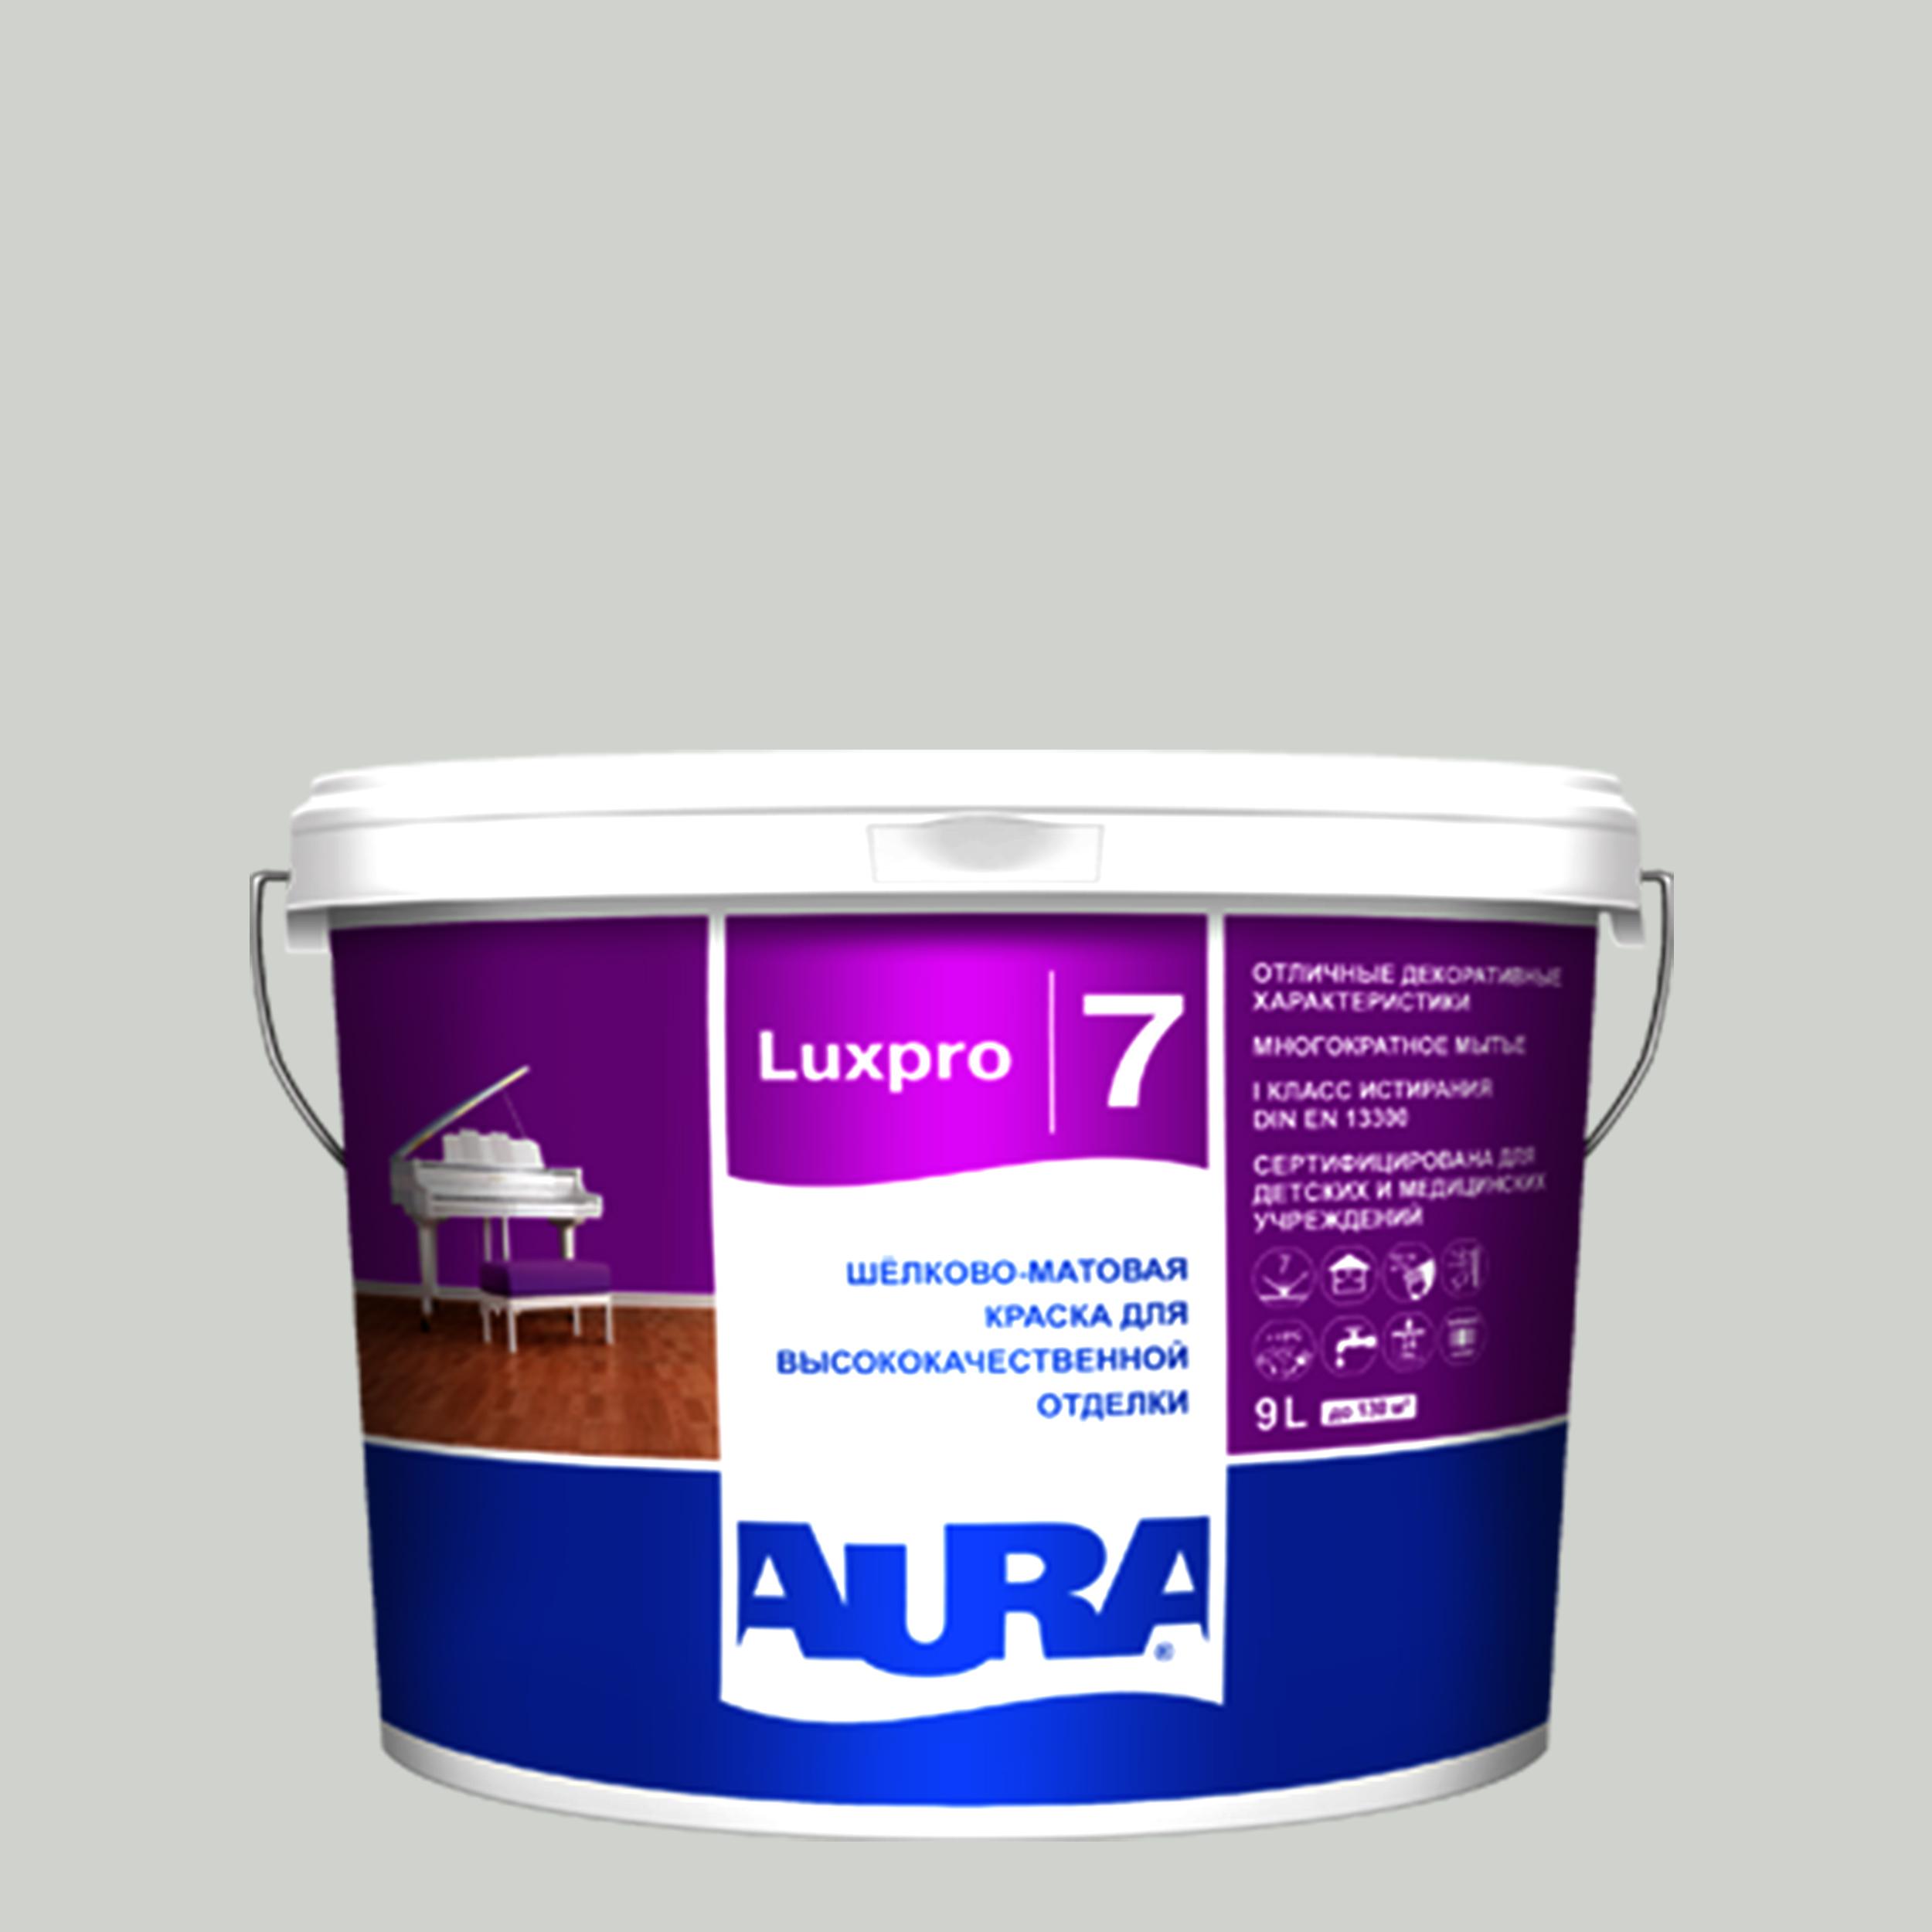 Фото 5 - Краска интерьерная, Aura LuxPRO 7, RAL 6029, 11 кг.